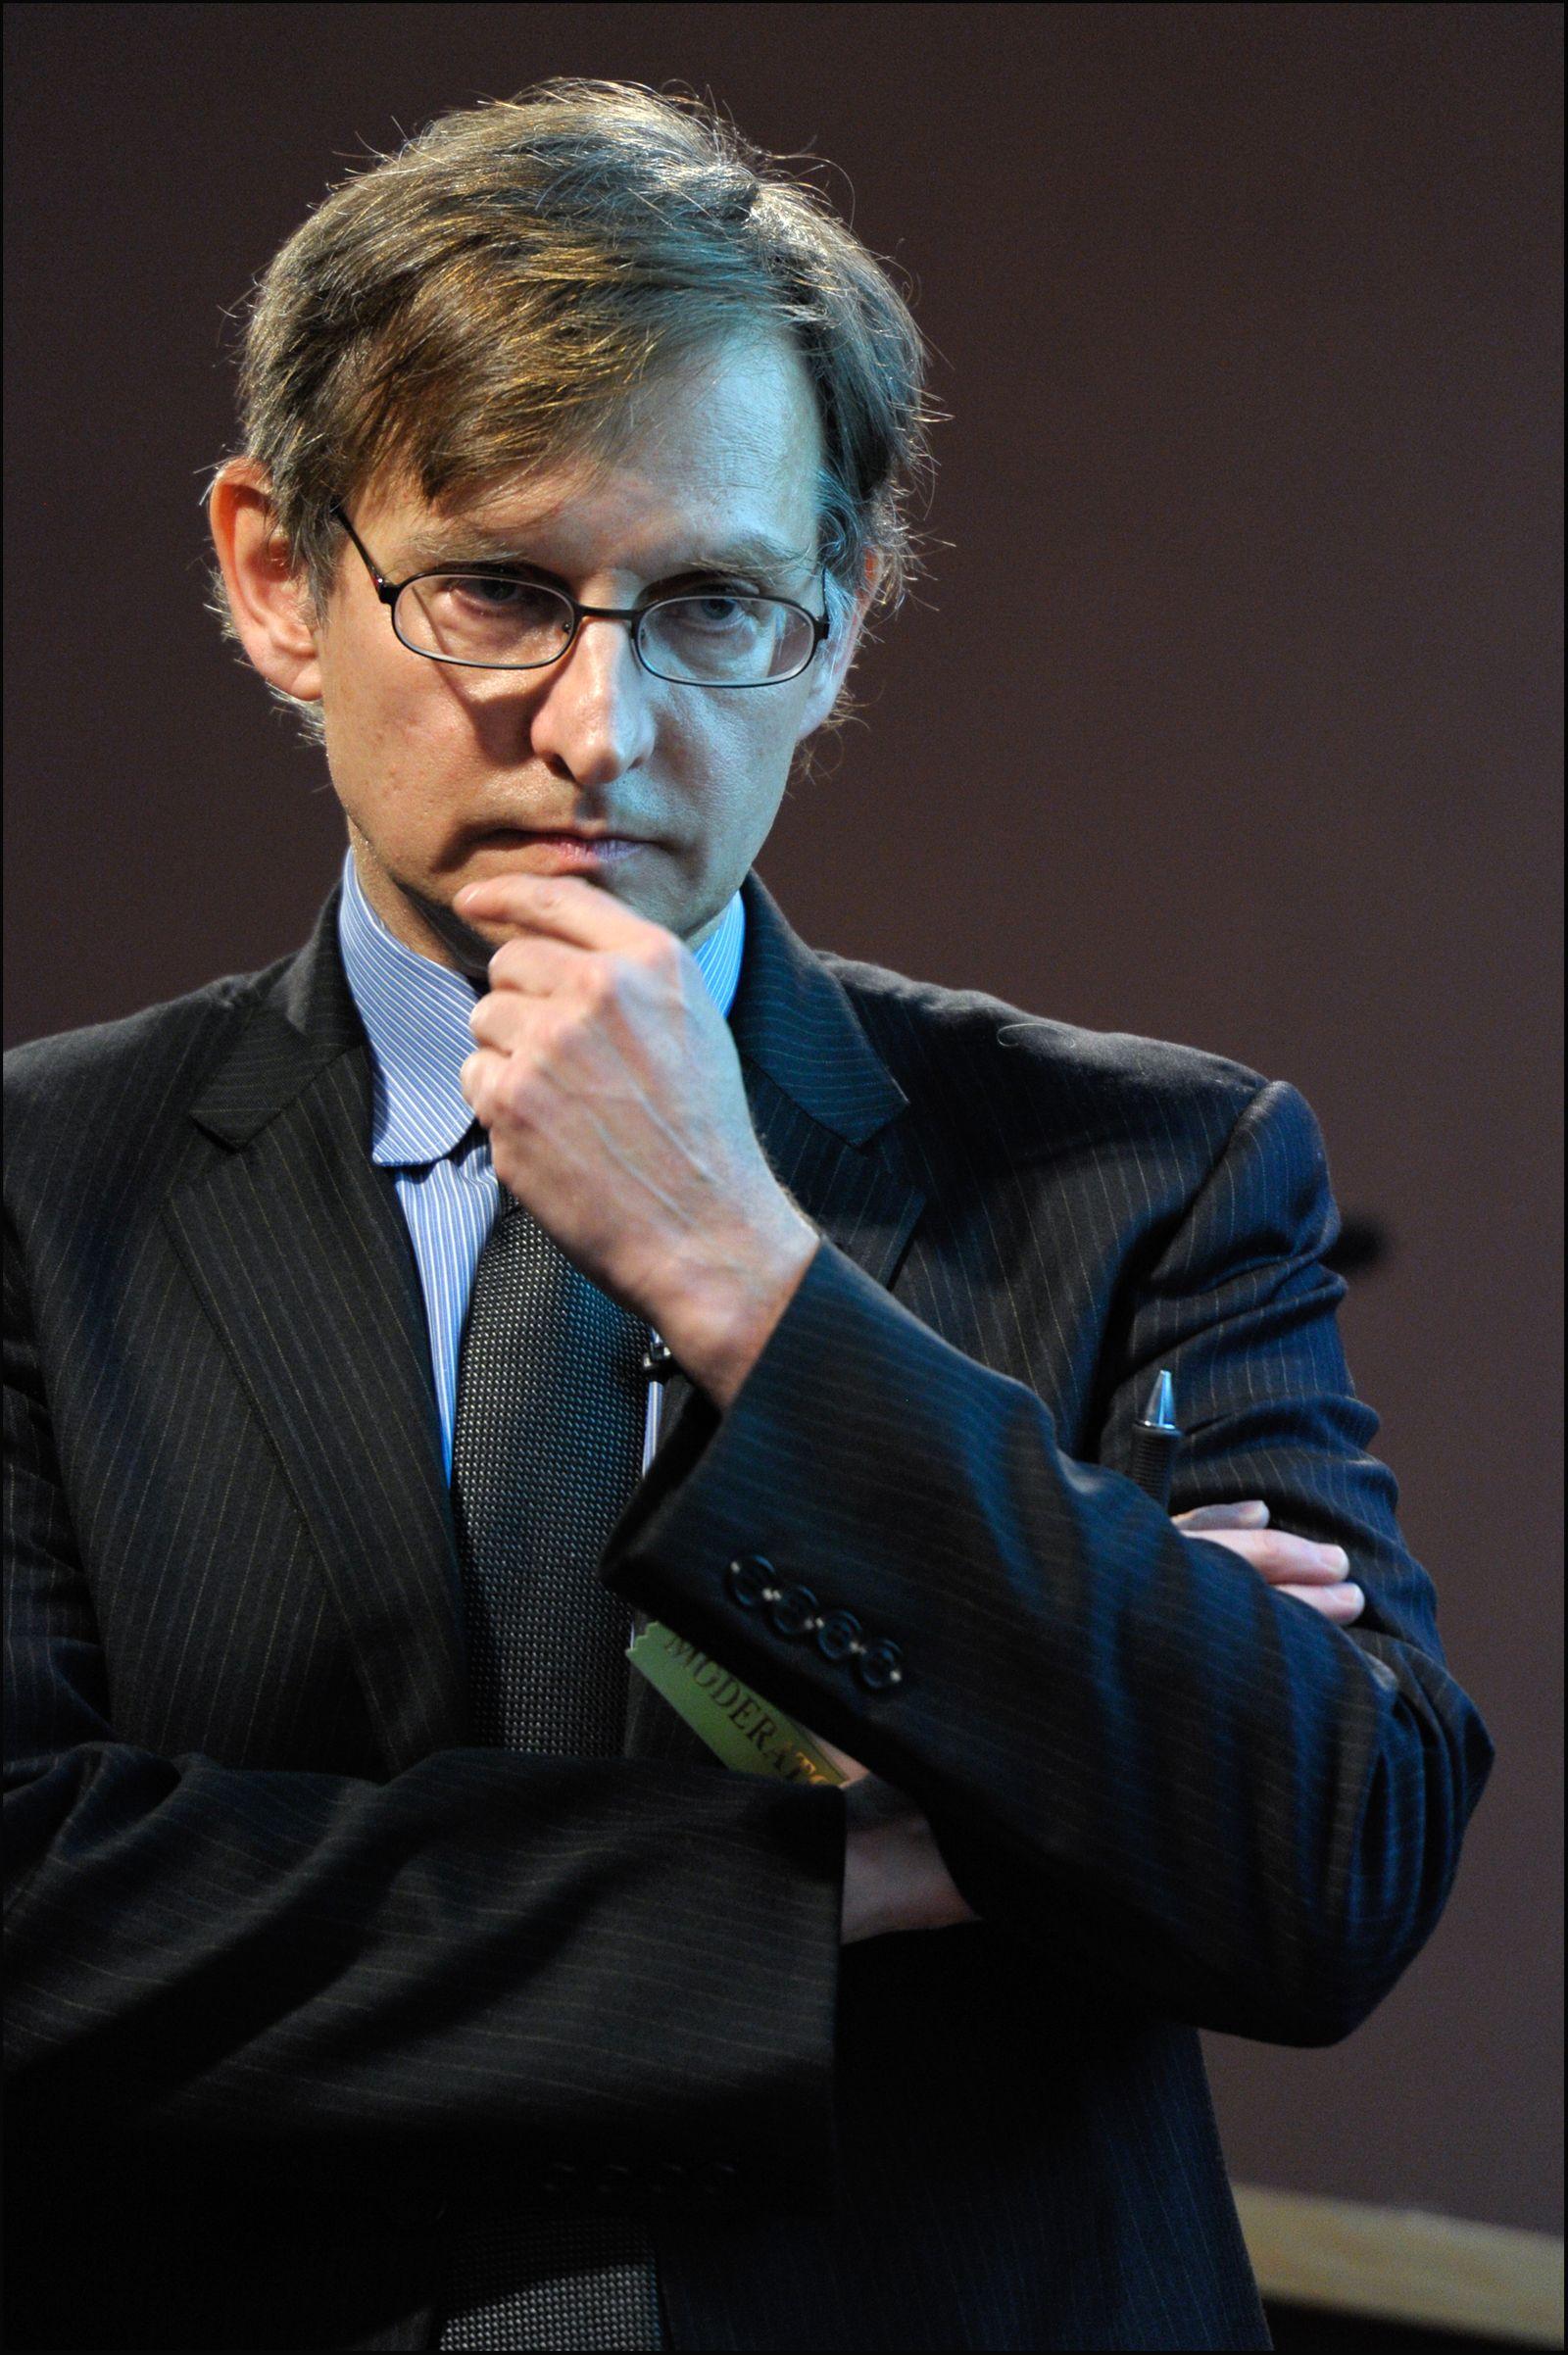 Dr. W. Ian Lipkin, Epidemiologist & expert of infectious diseases